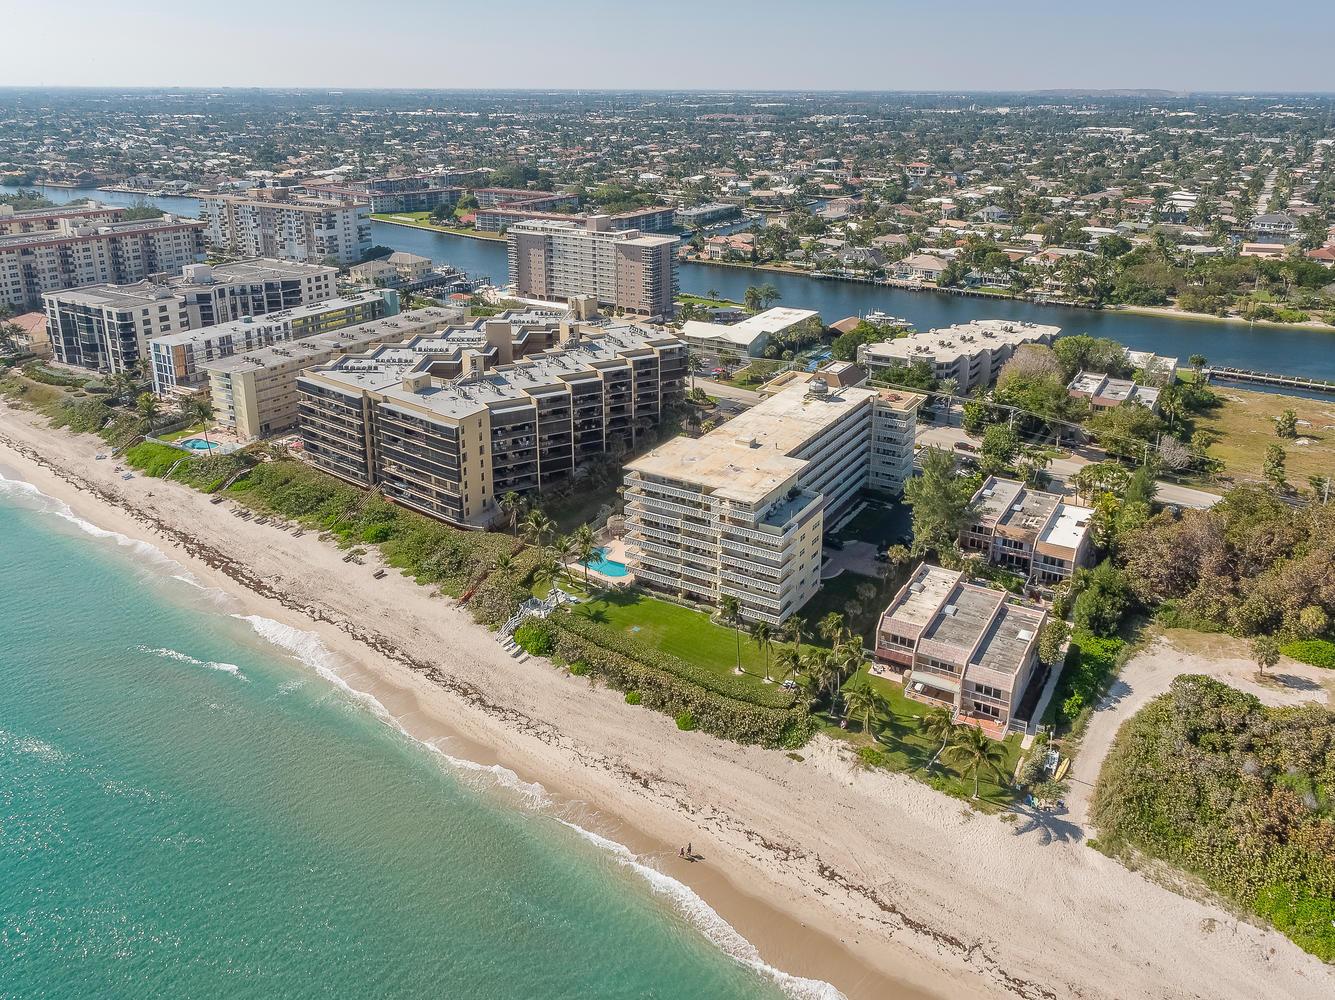 1169 Hillsboro Mile, Hillsboro Beach, Florida 33062, 2 Bedrooms Bedrooms, ,2 BathroomsBathrooms,Condo/Coop,For Sale,Hillsboro Mile,519,RX-10497363